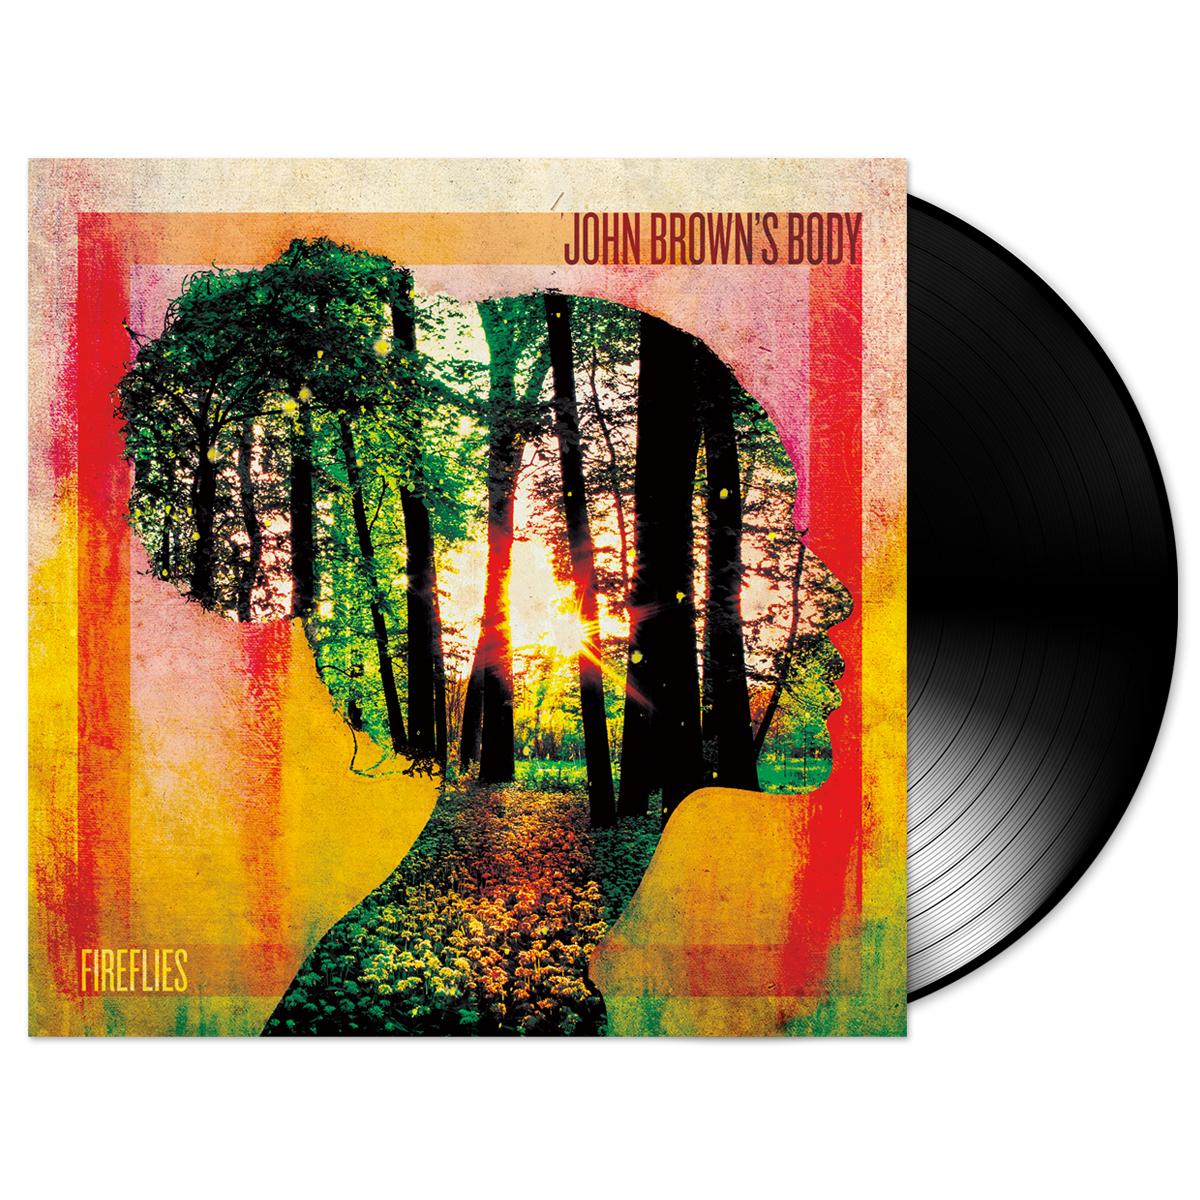 John Brown's Body Fireflies Vinyl